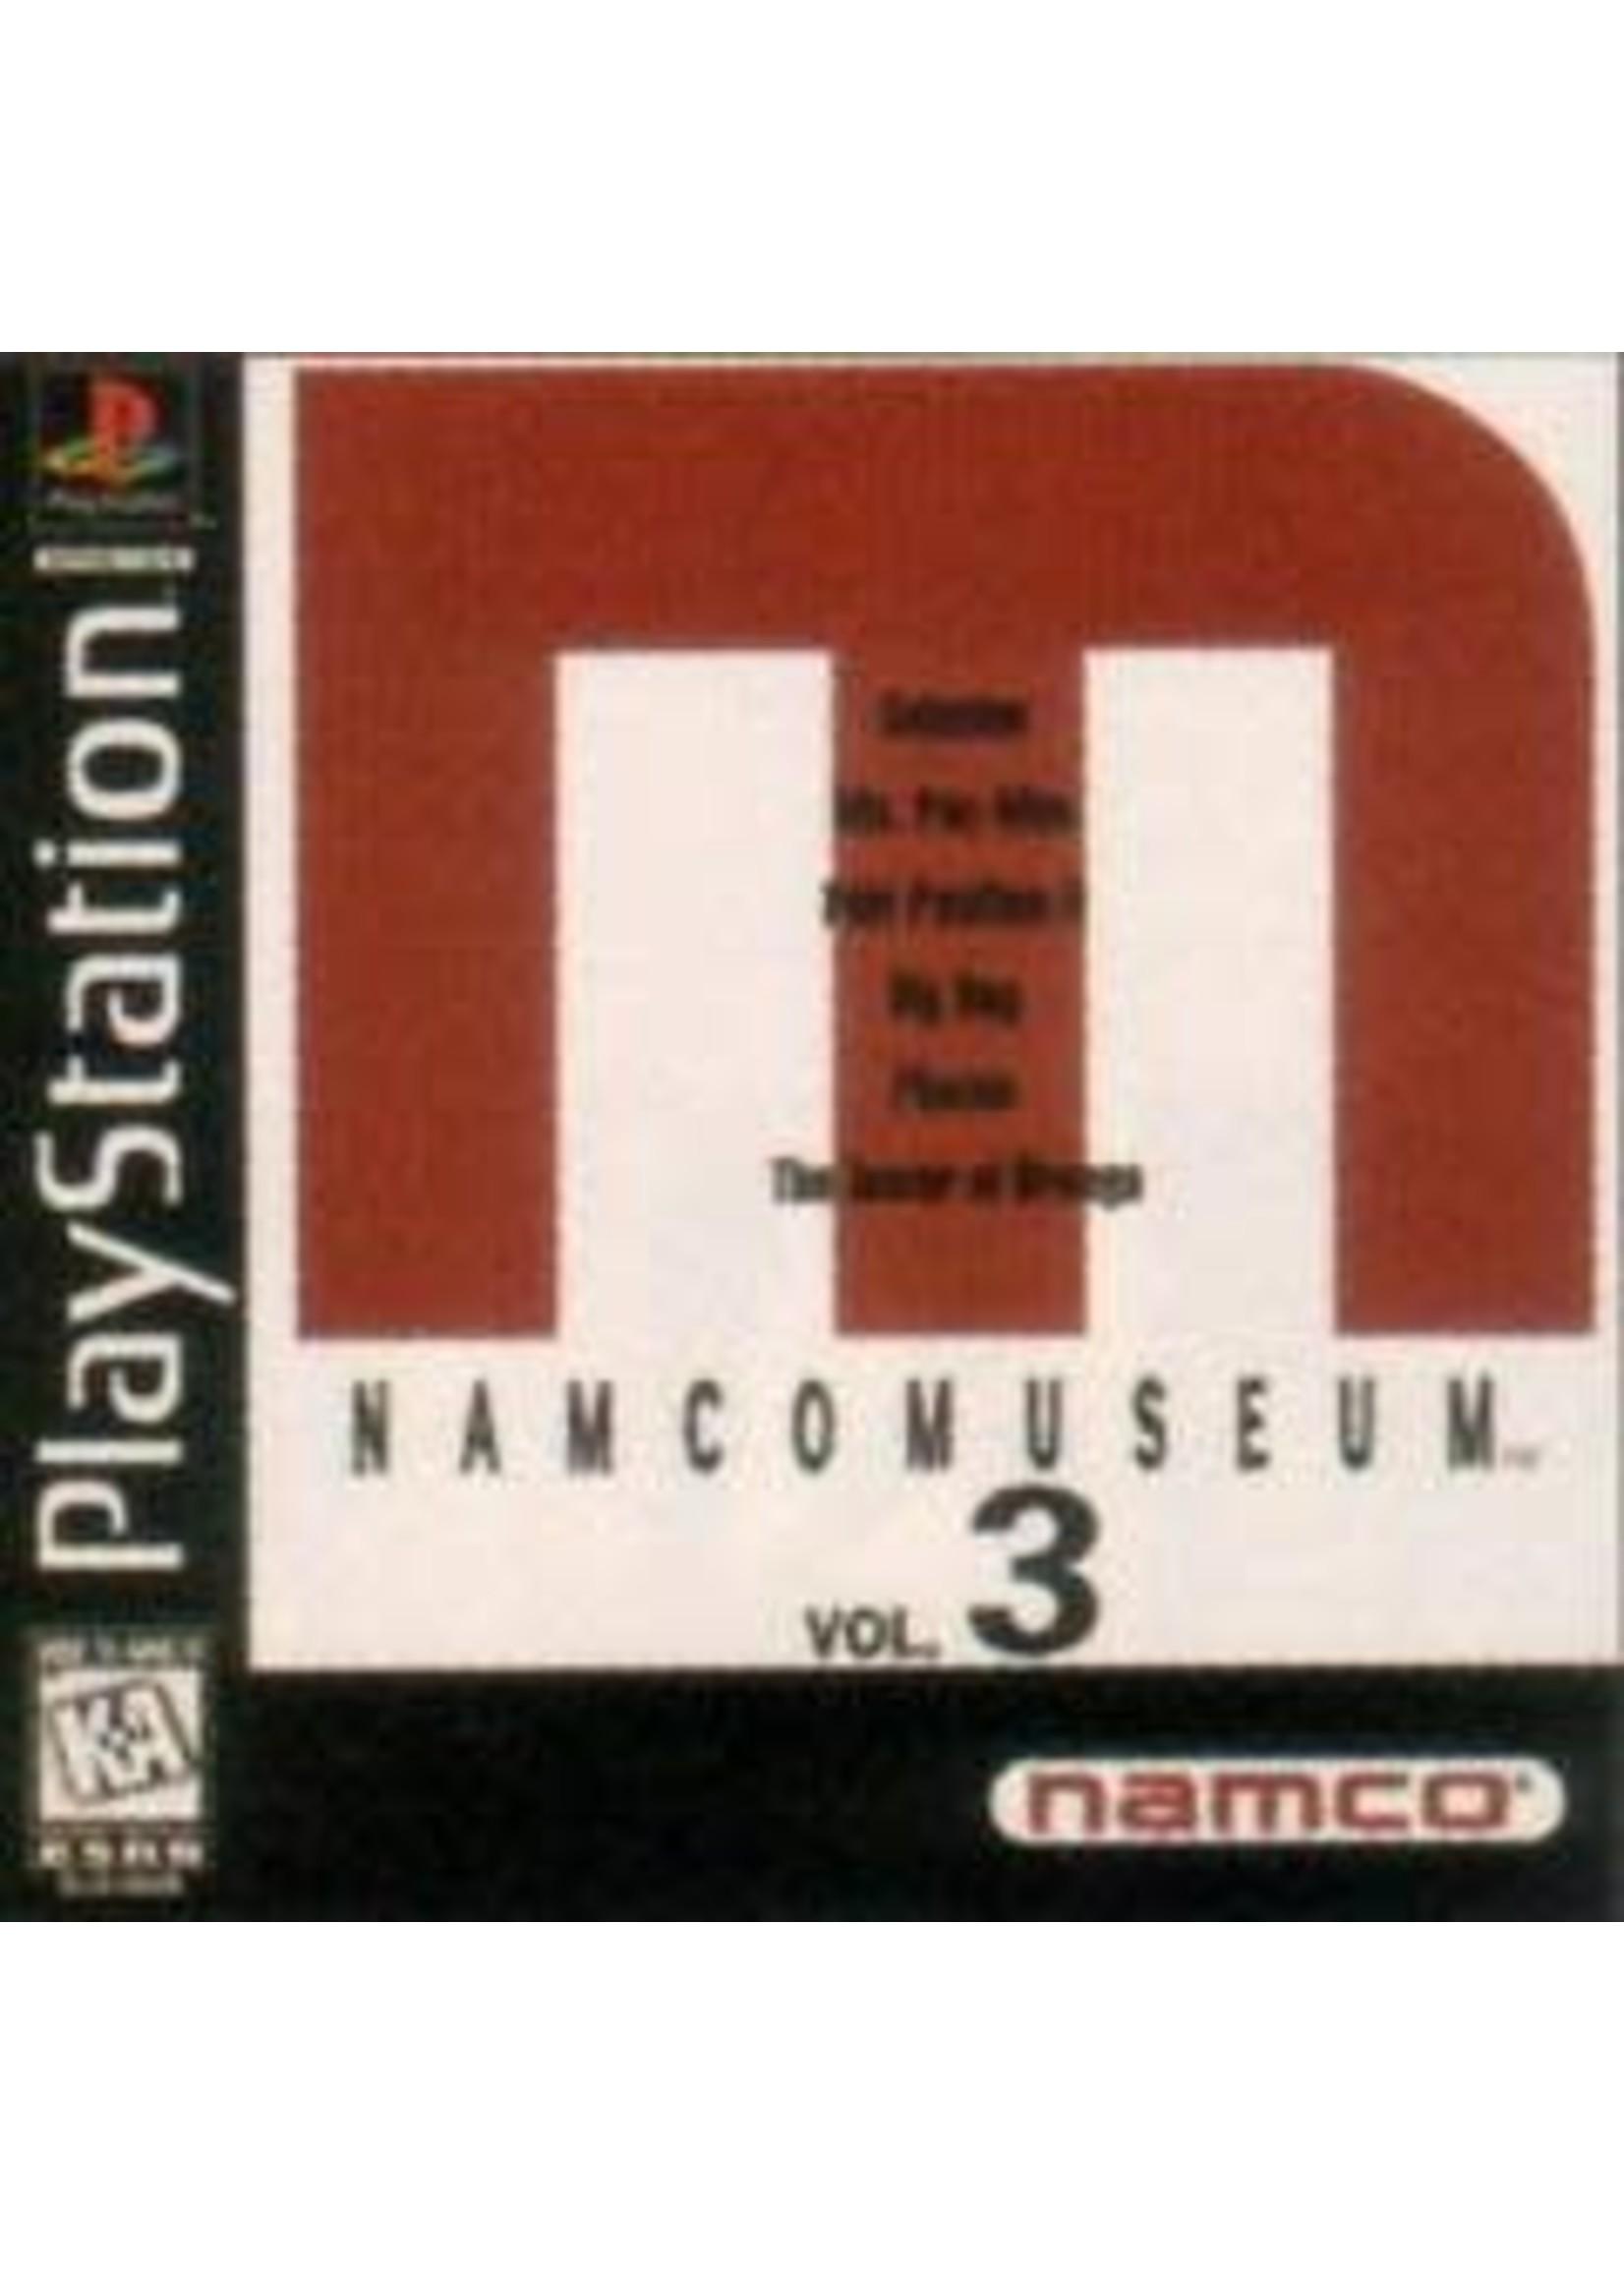 Namco Museum Volume 3 Playstation